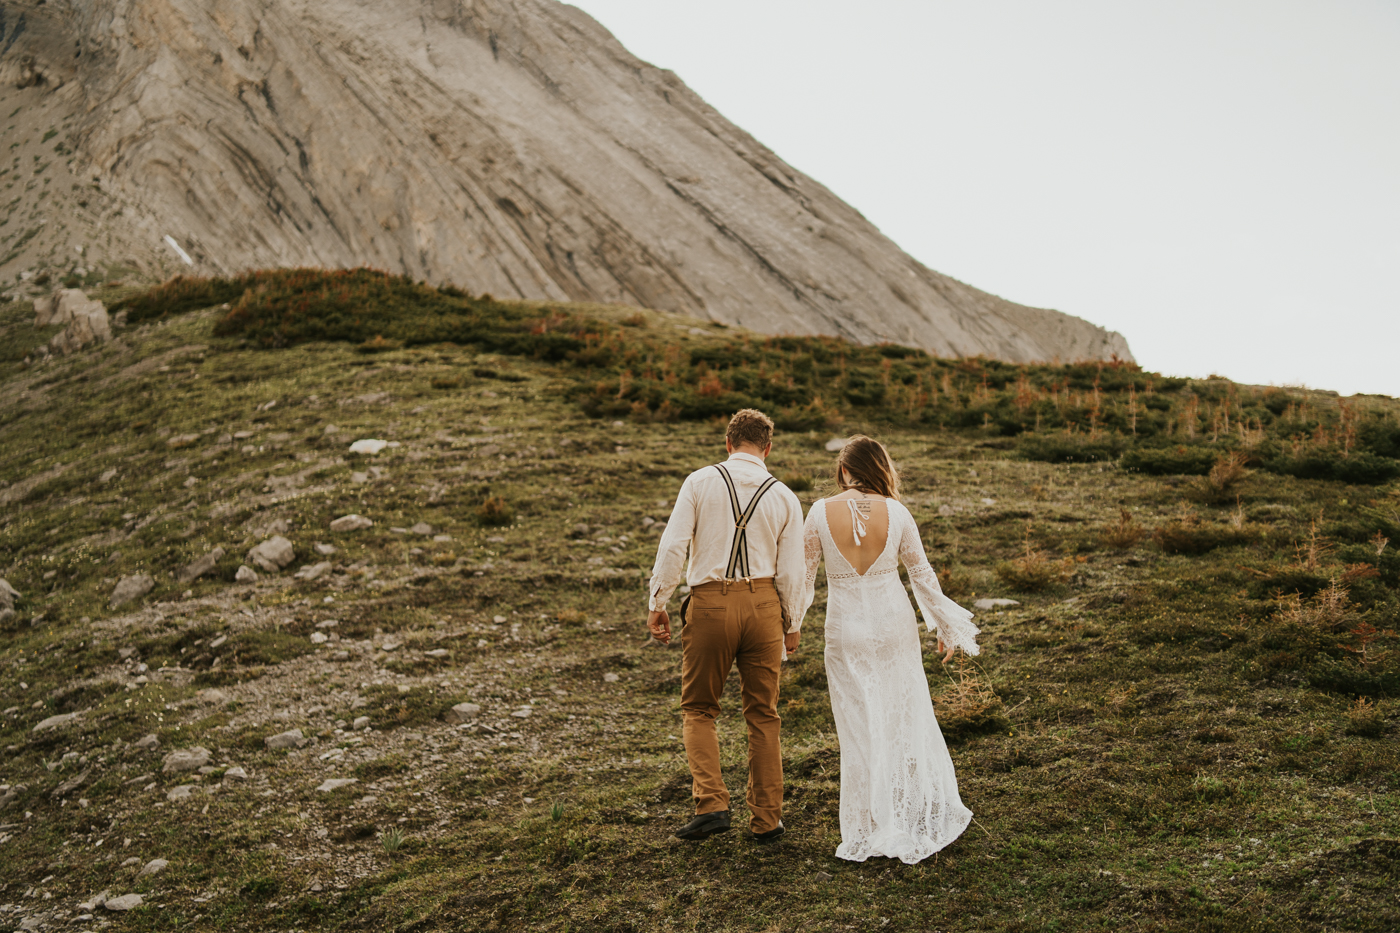 tyraephotography_photographer_wedding_elopement_engagement_photography-07715.jpg